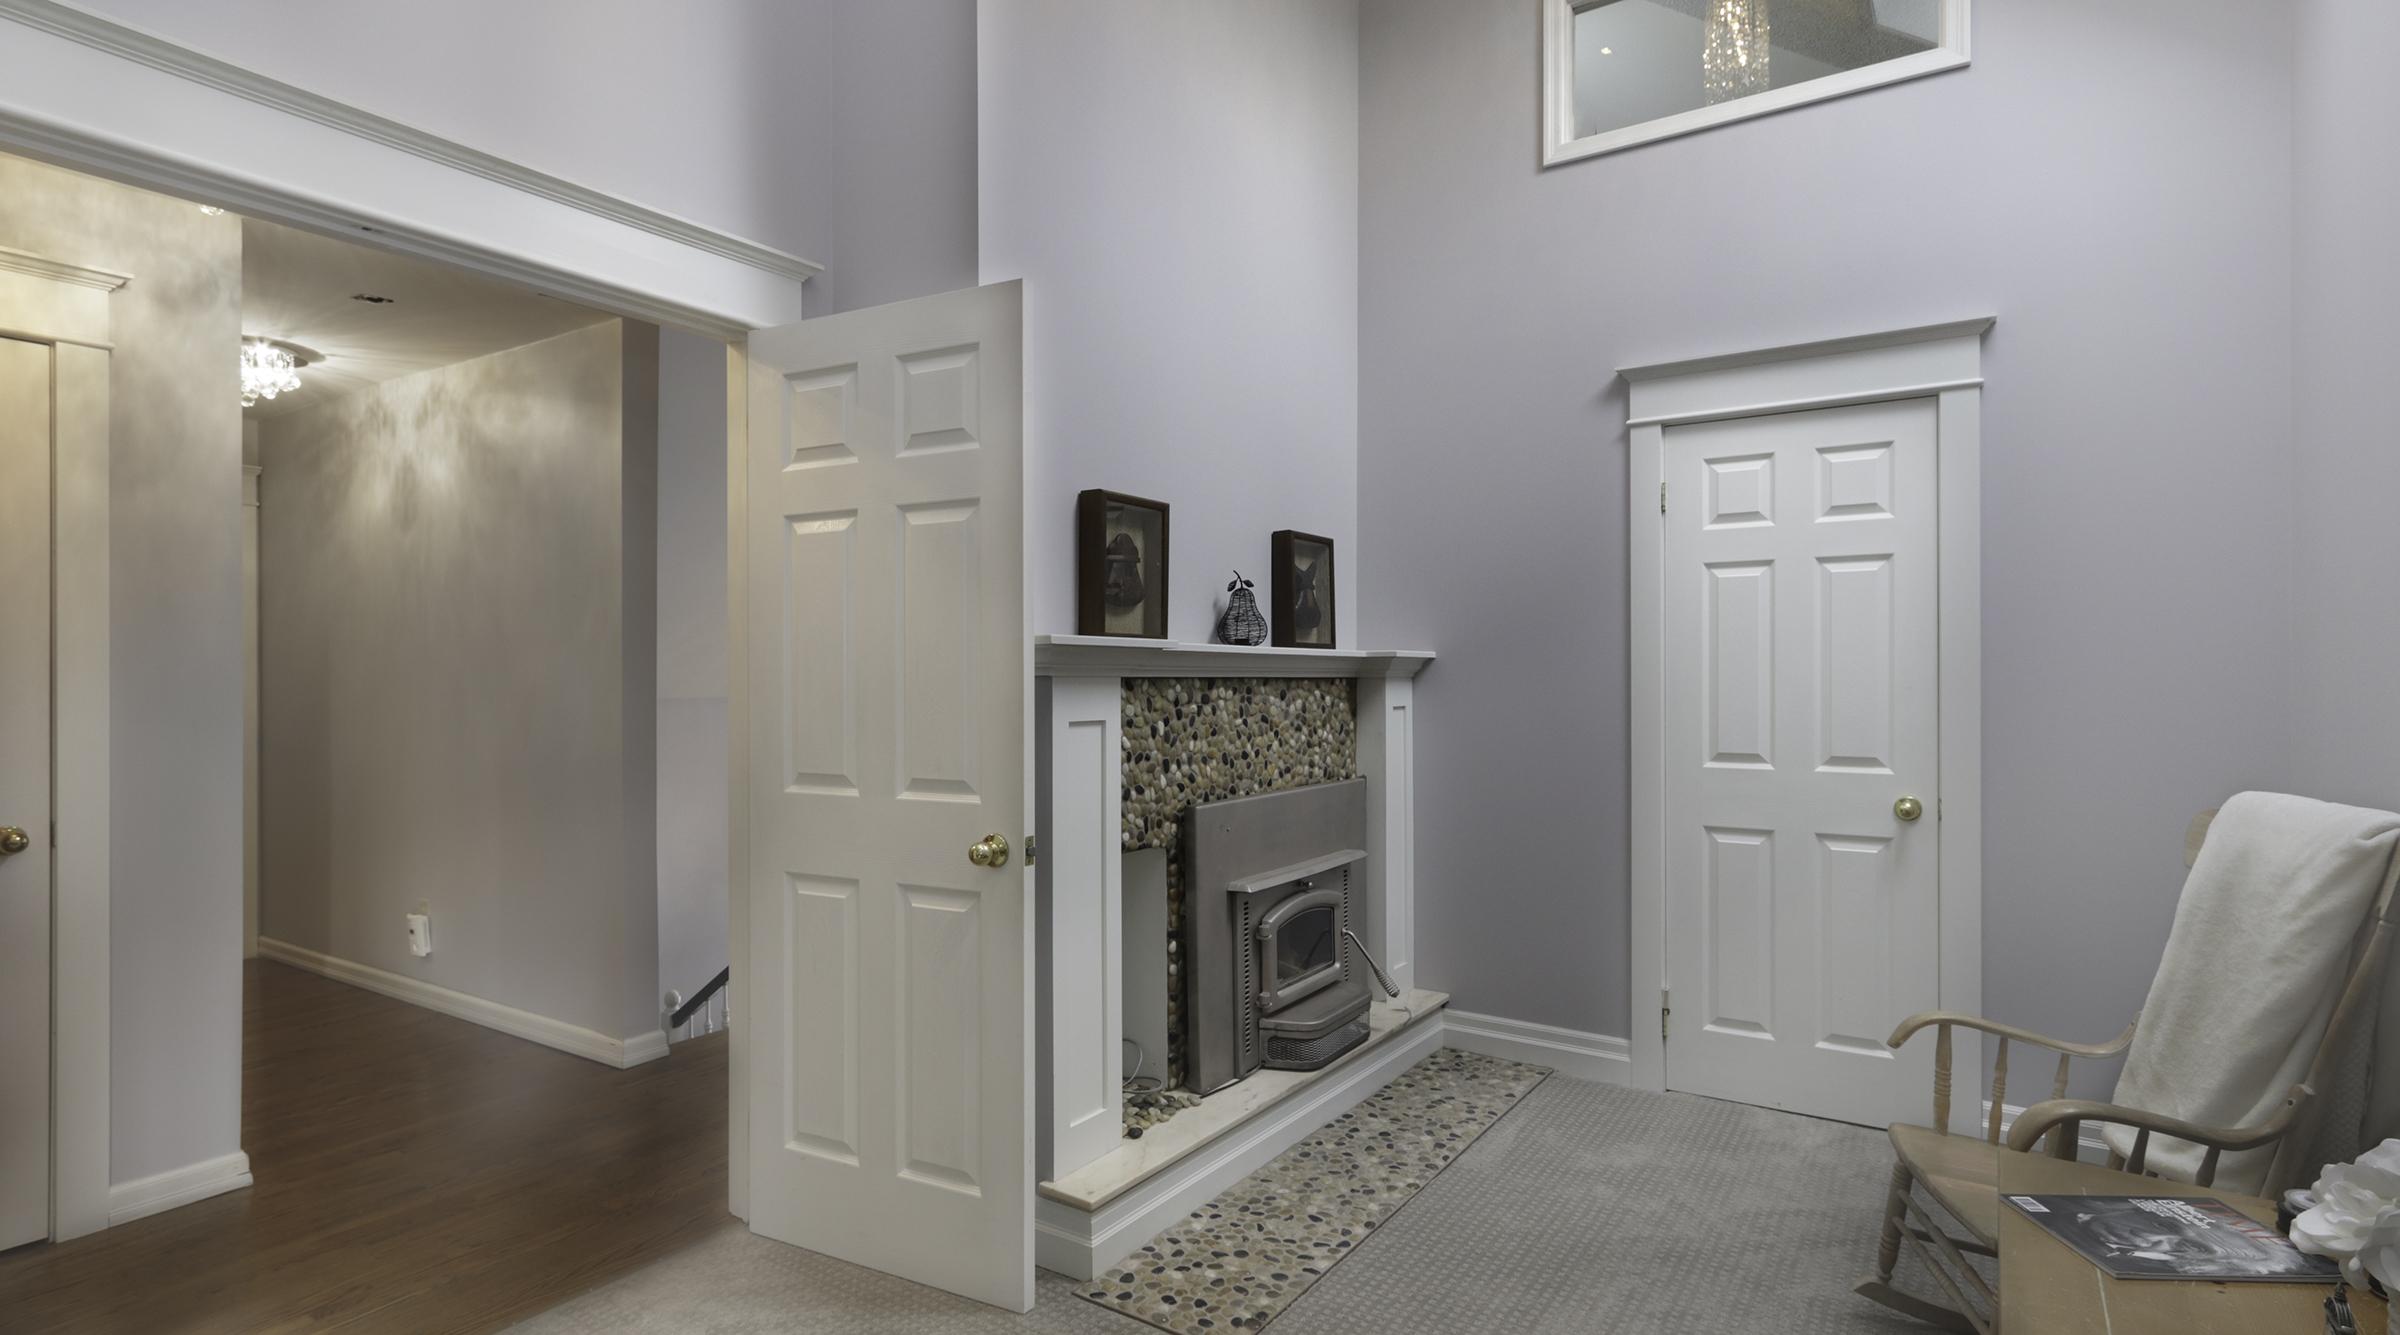 MTBS - 9170 Ashburn renovation